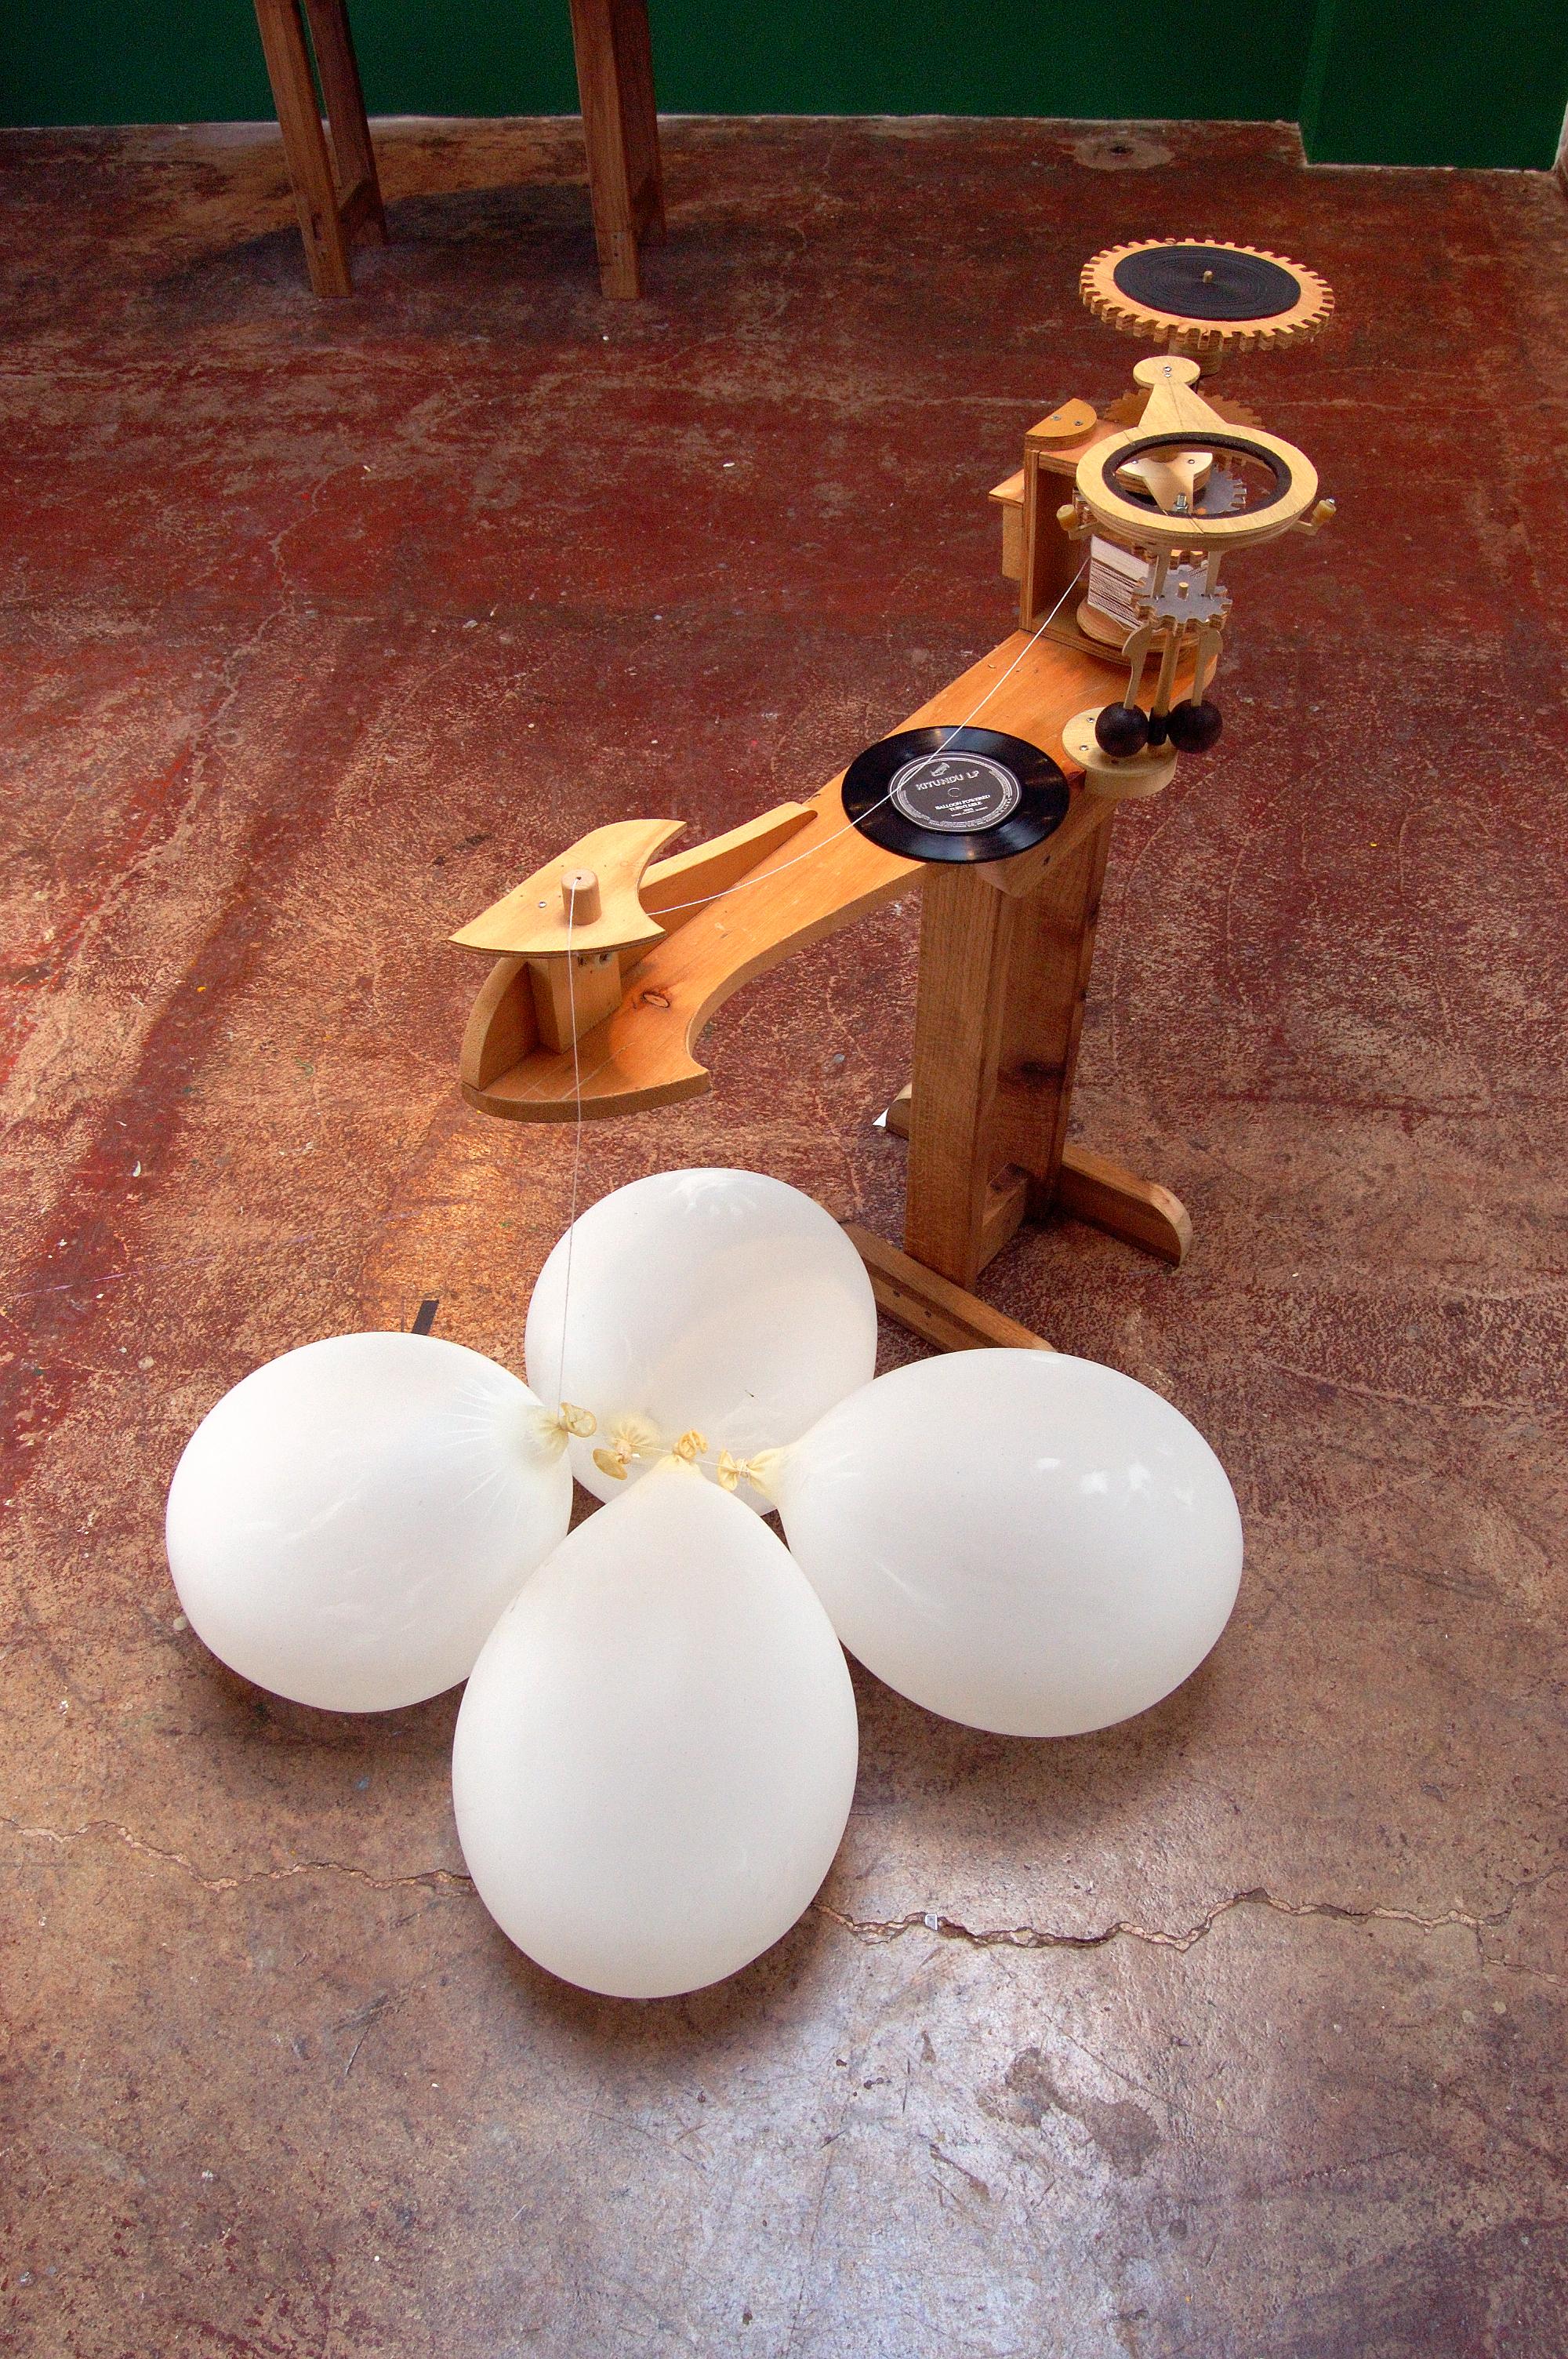 Balloon-powered Phonograph (2005)